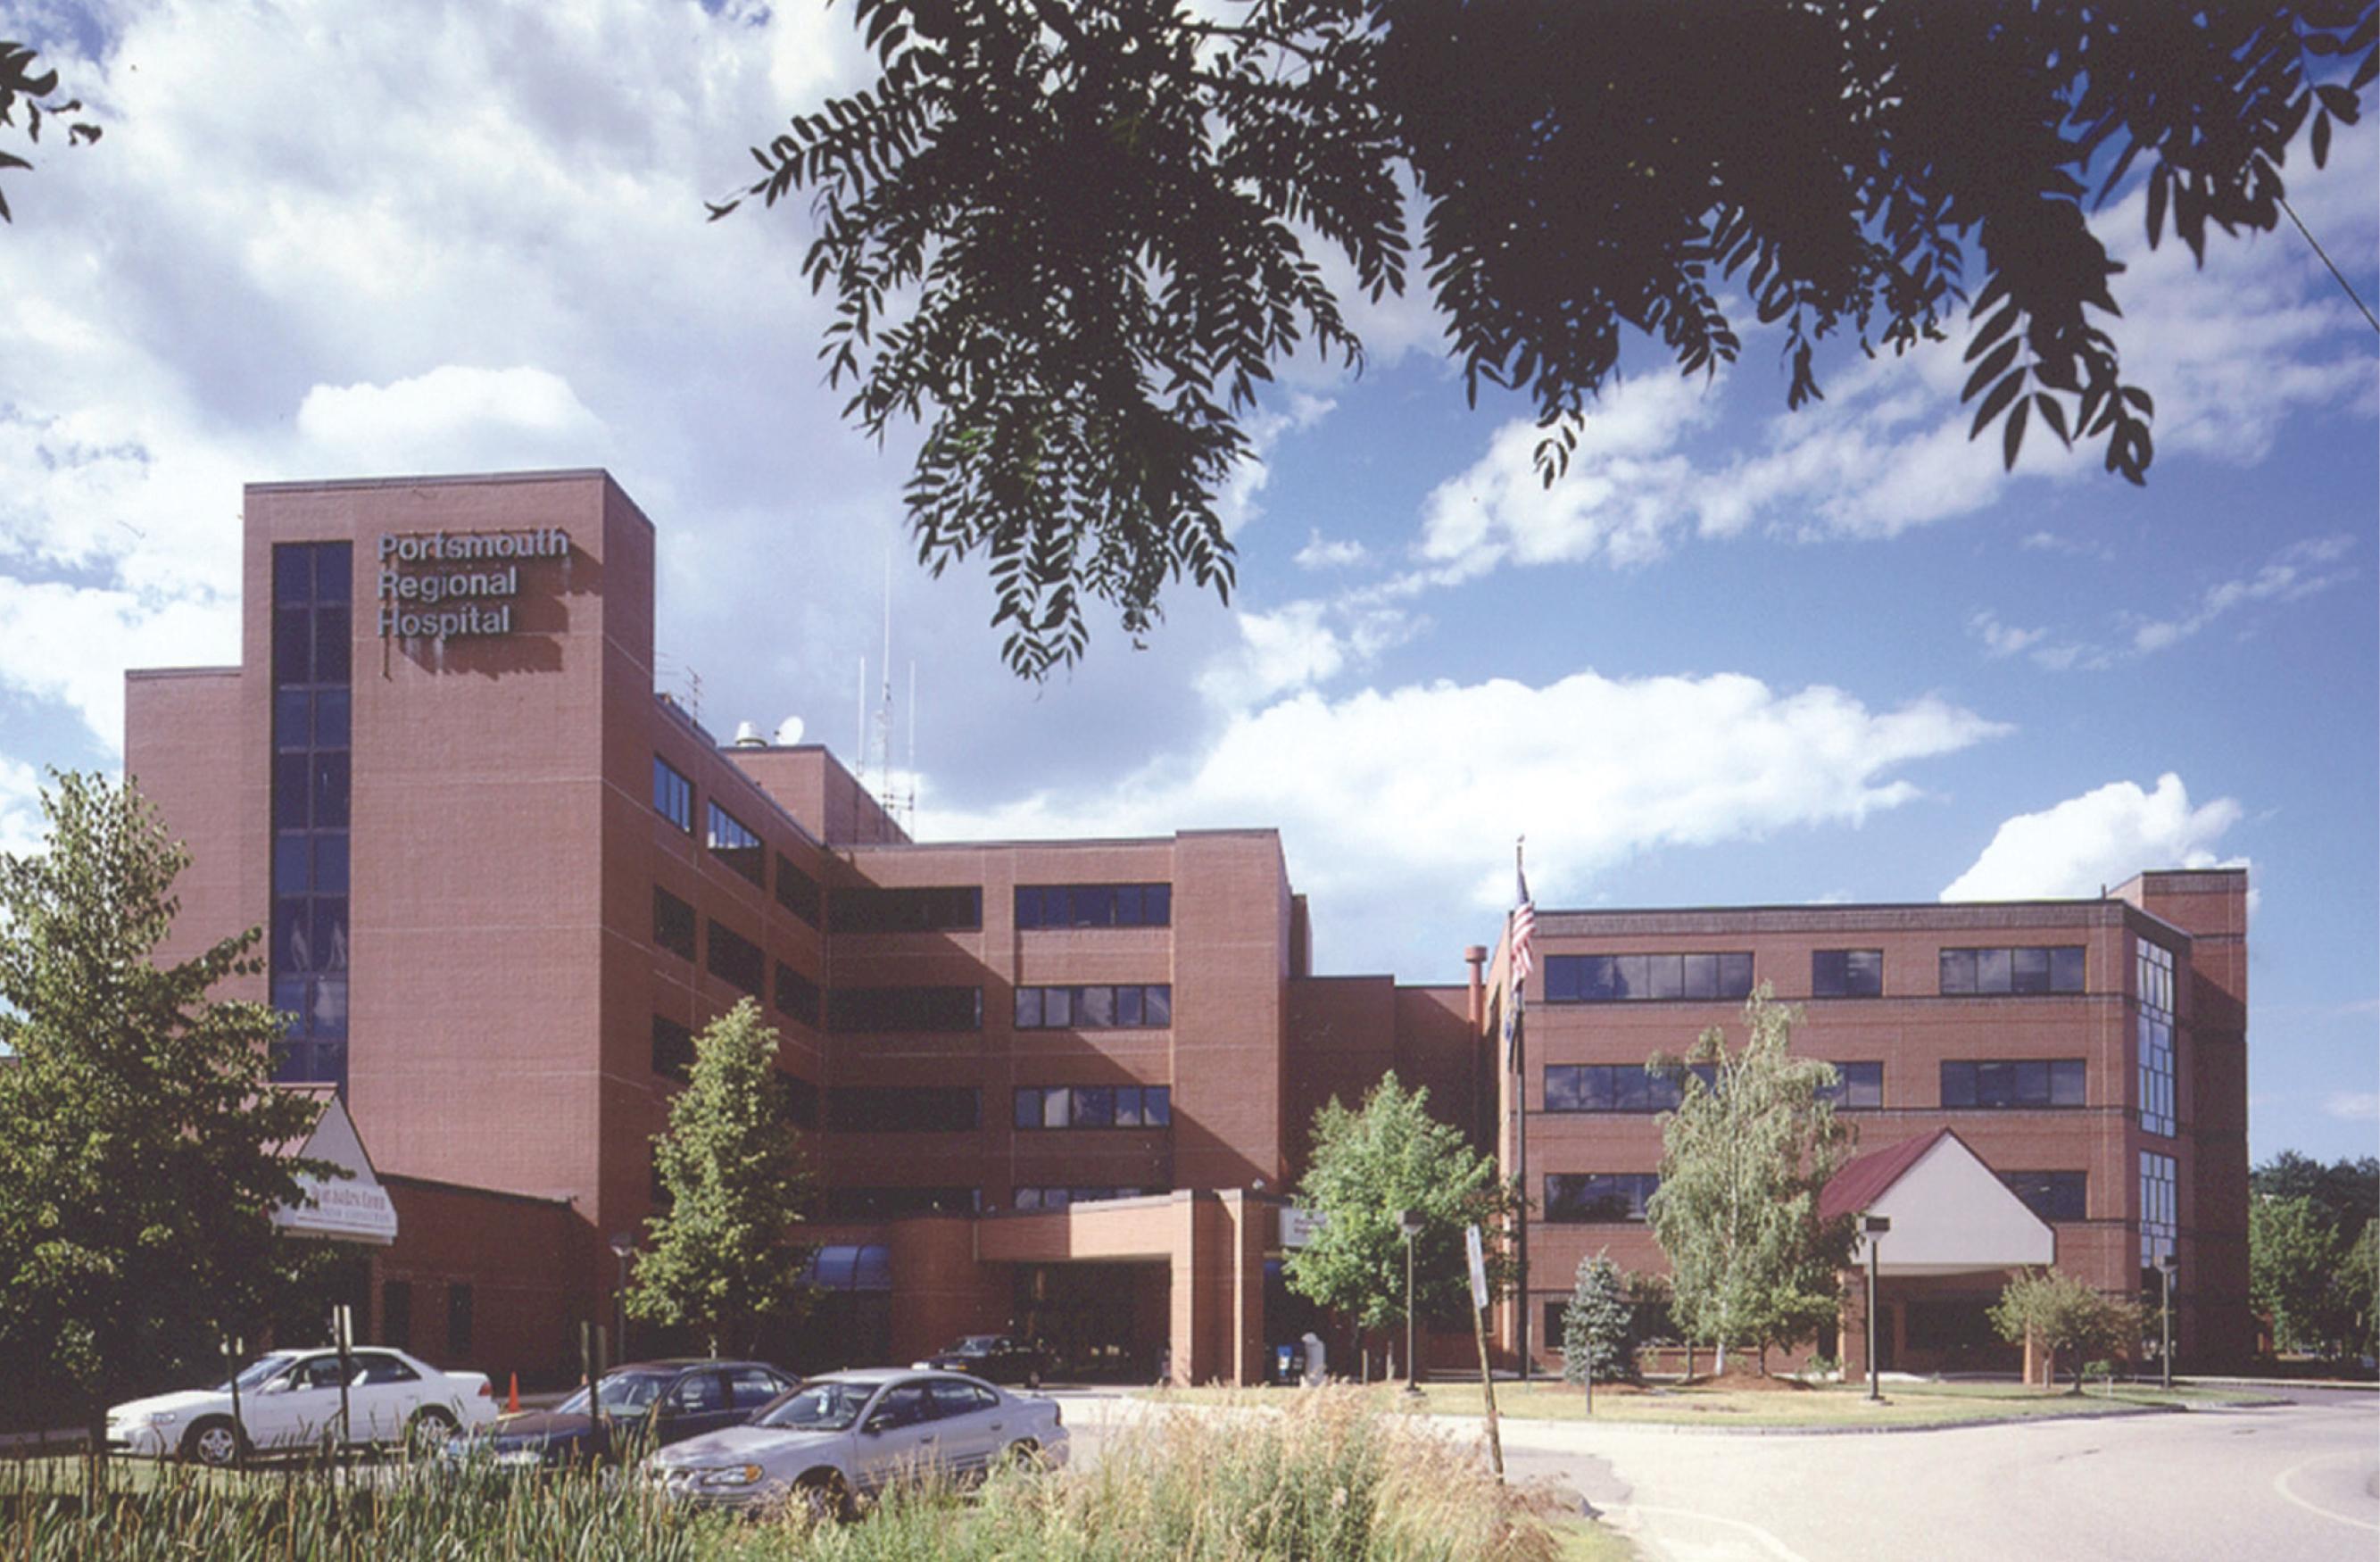 Portsmouth Regional Hospital